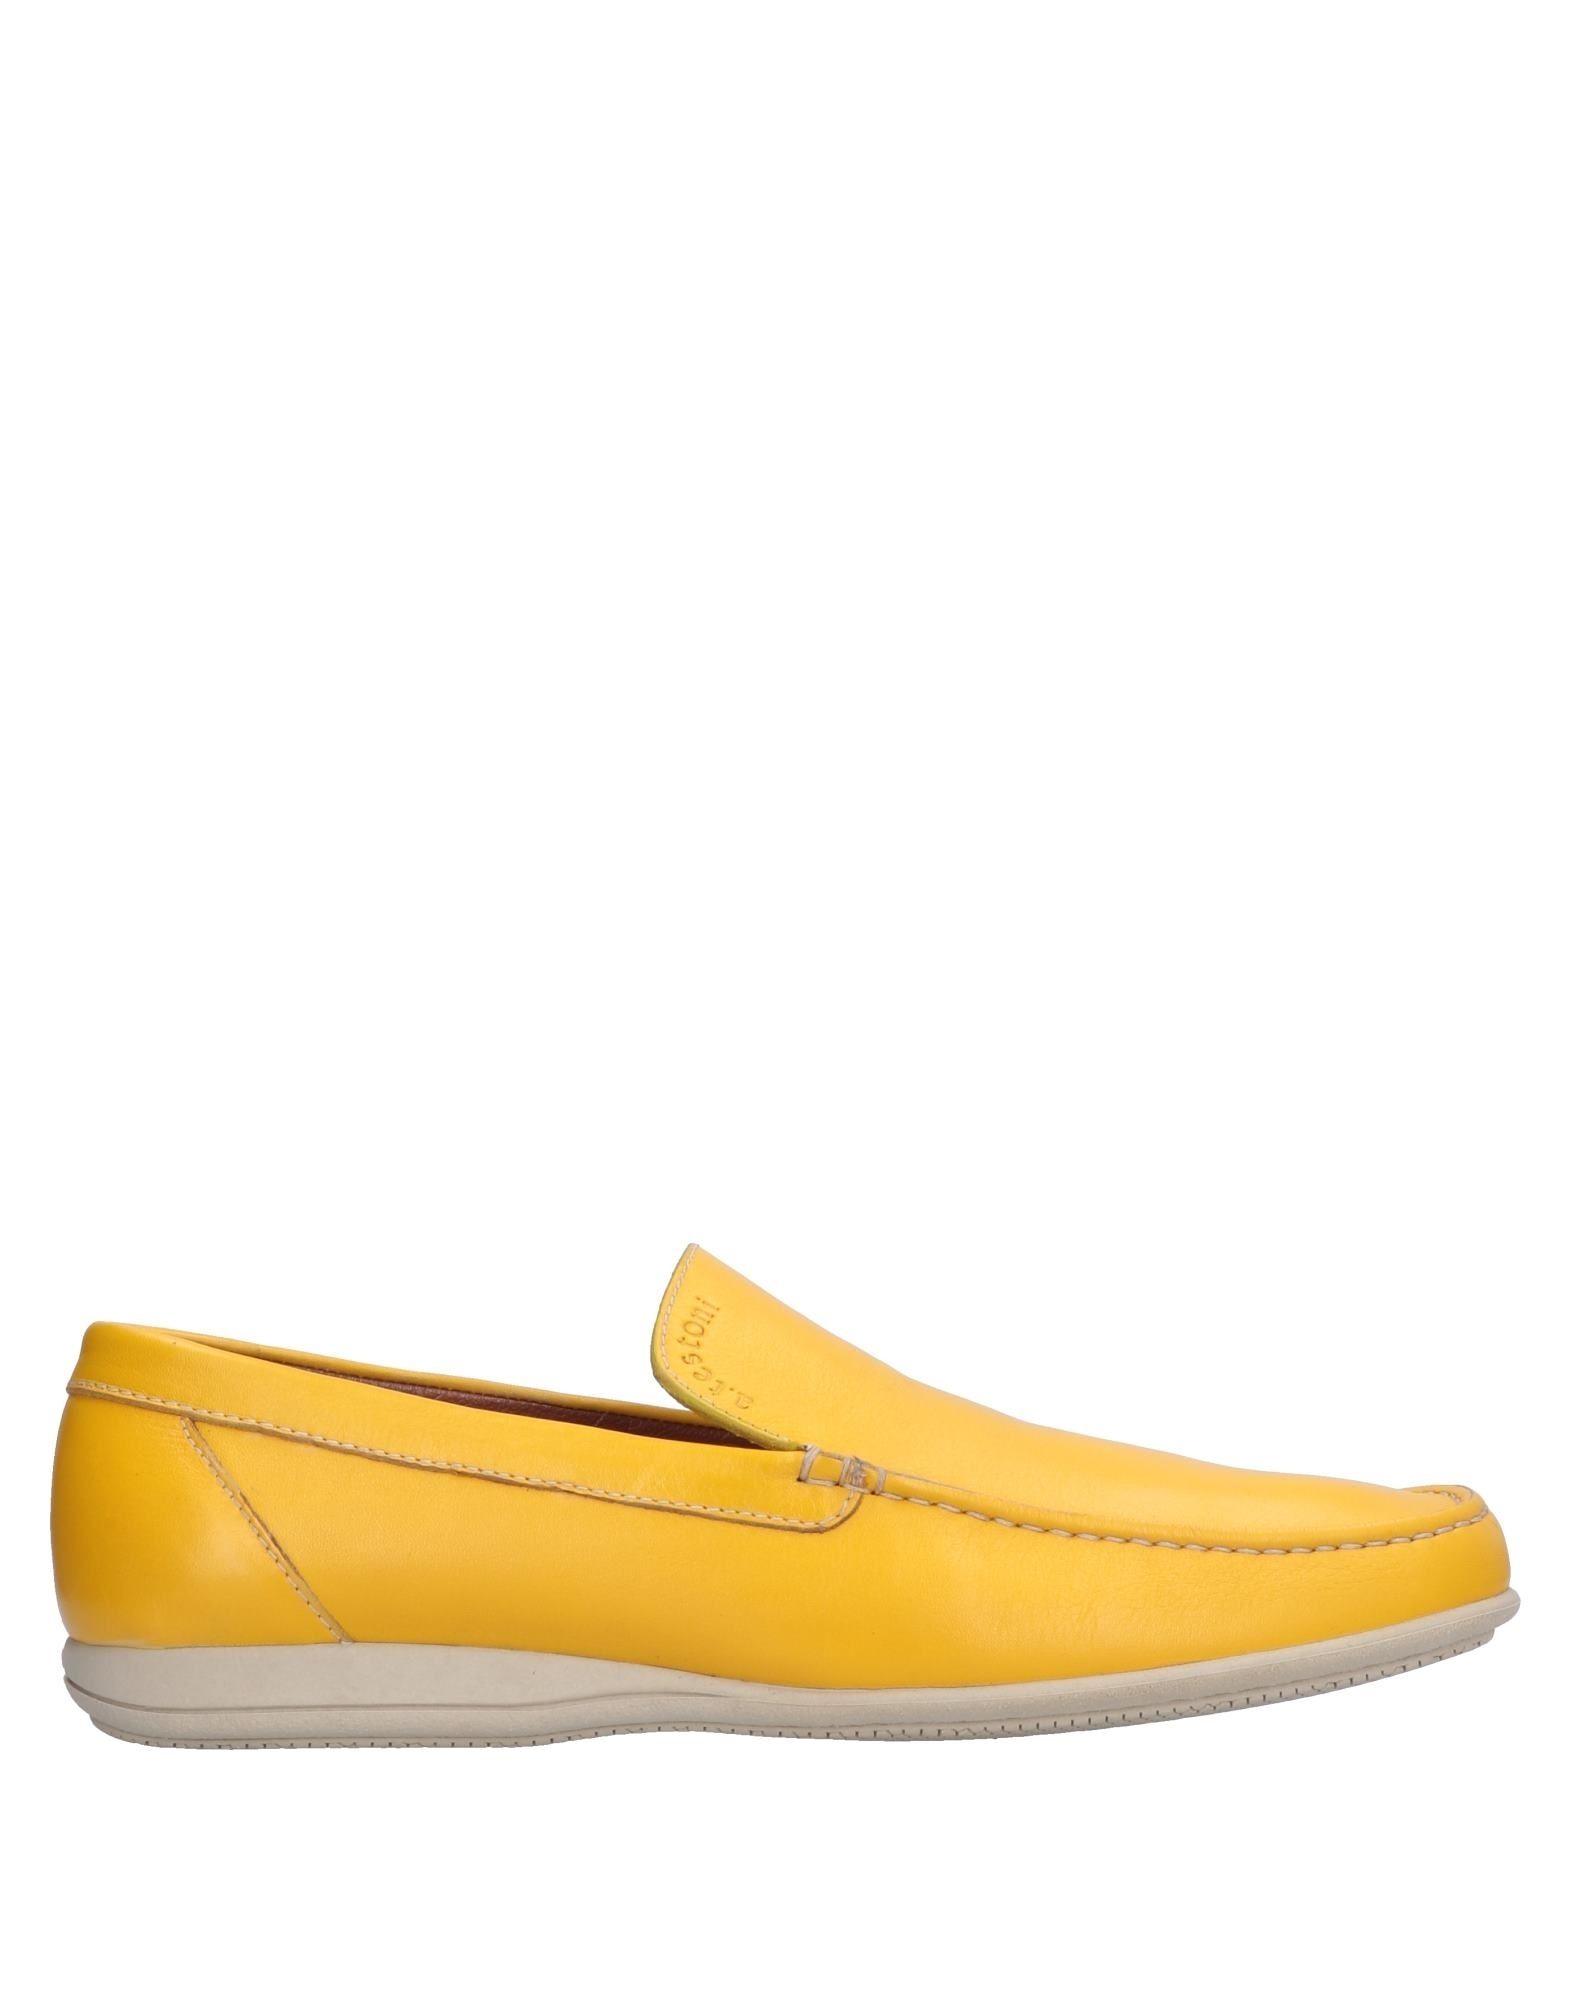 A.Testoni Mokassins Herren  11353272NM Gute Qualität beliebte Schuhe